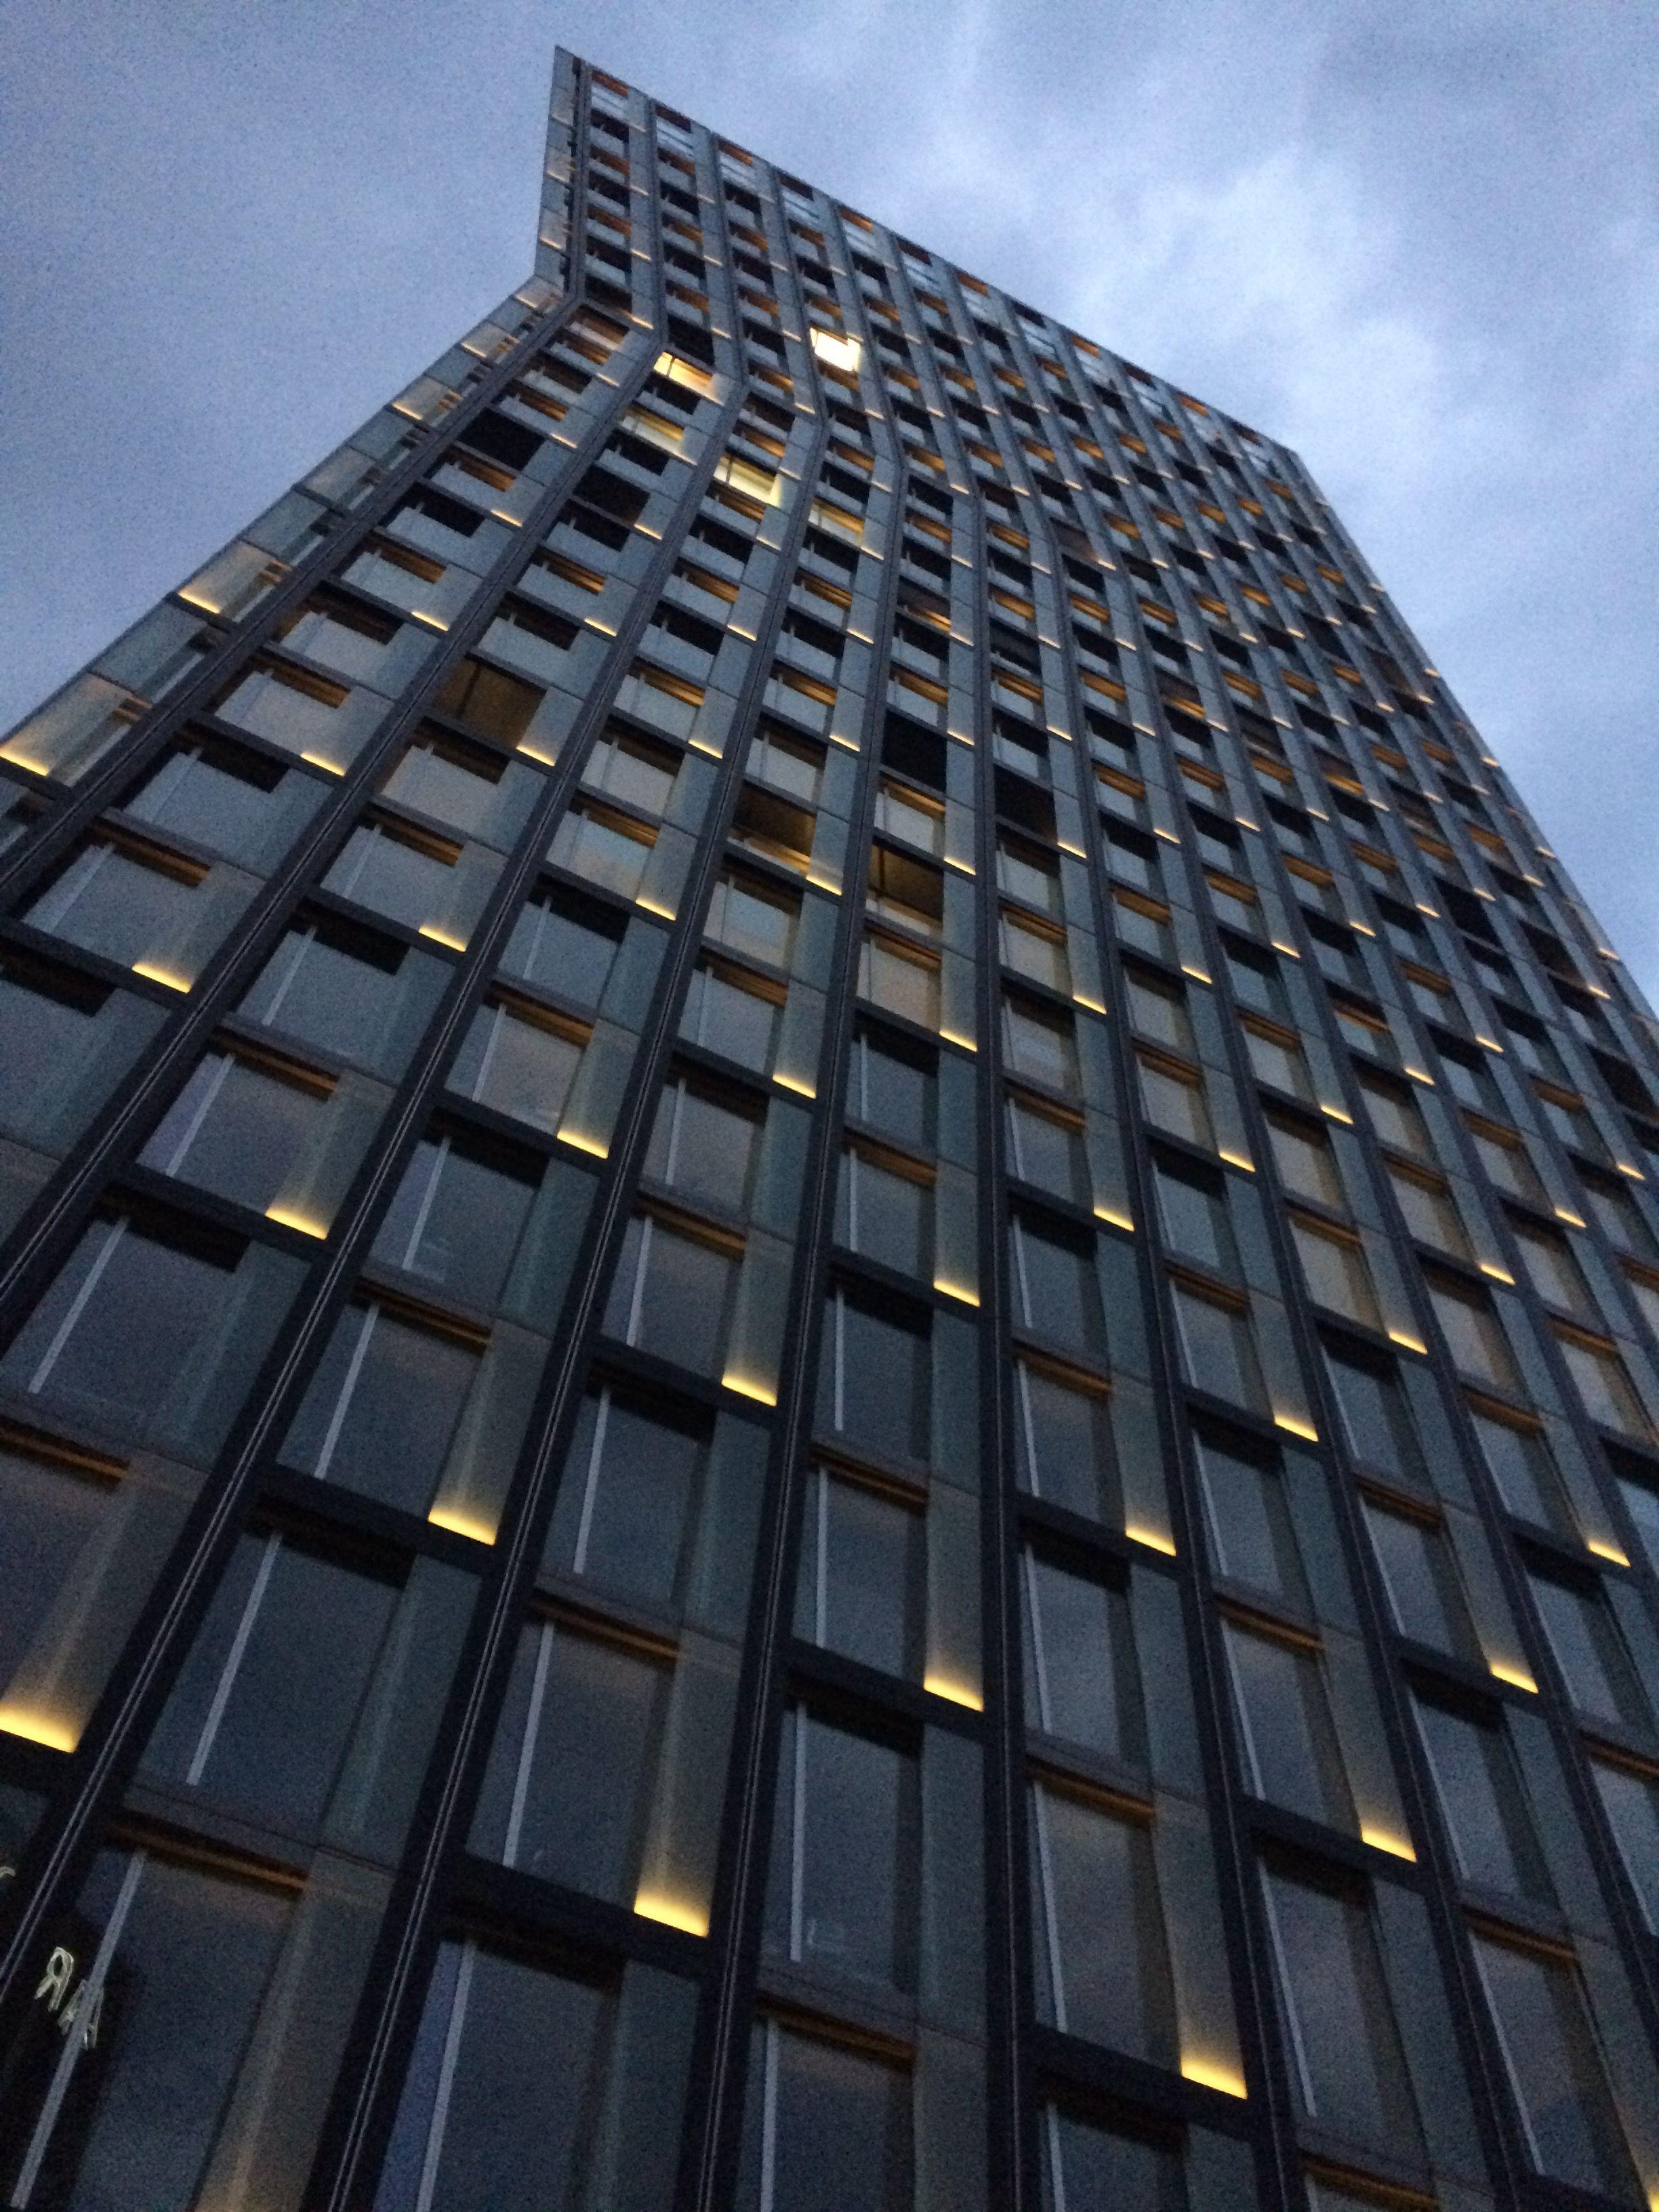 Building Exterior: Pin By Diana Metzner On Architektur